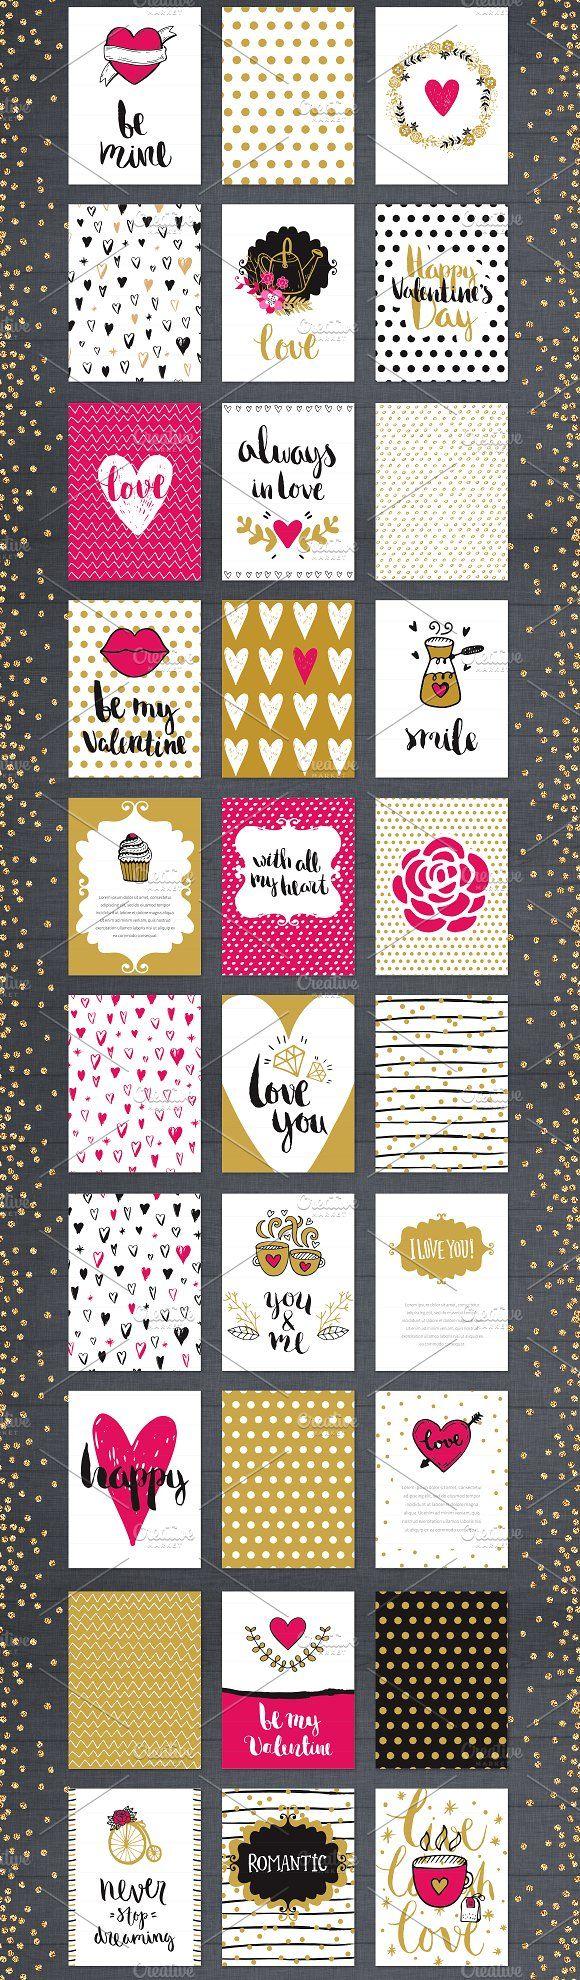 60 Valentine's Day Romantic Cards #1 - Illustrations